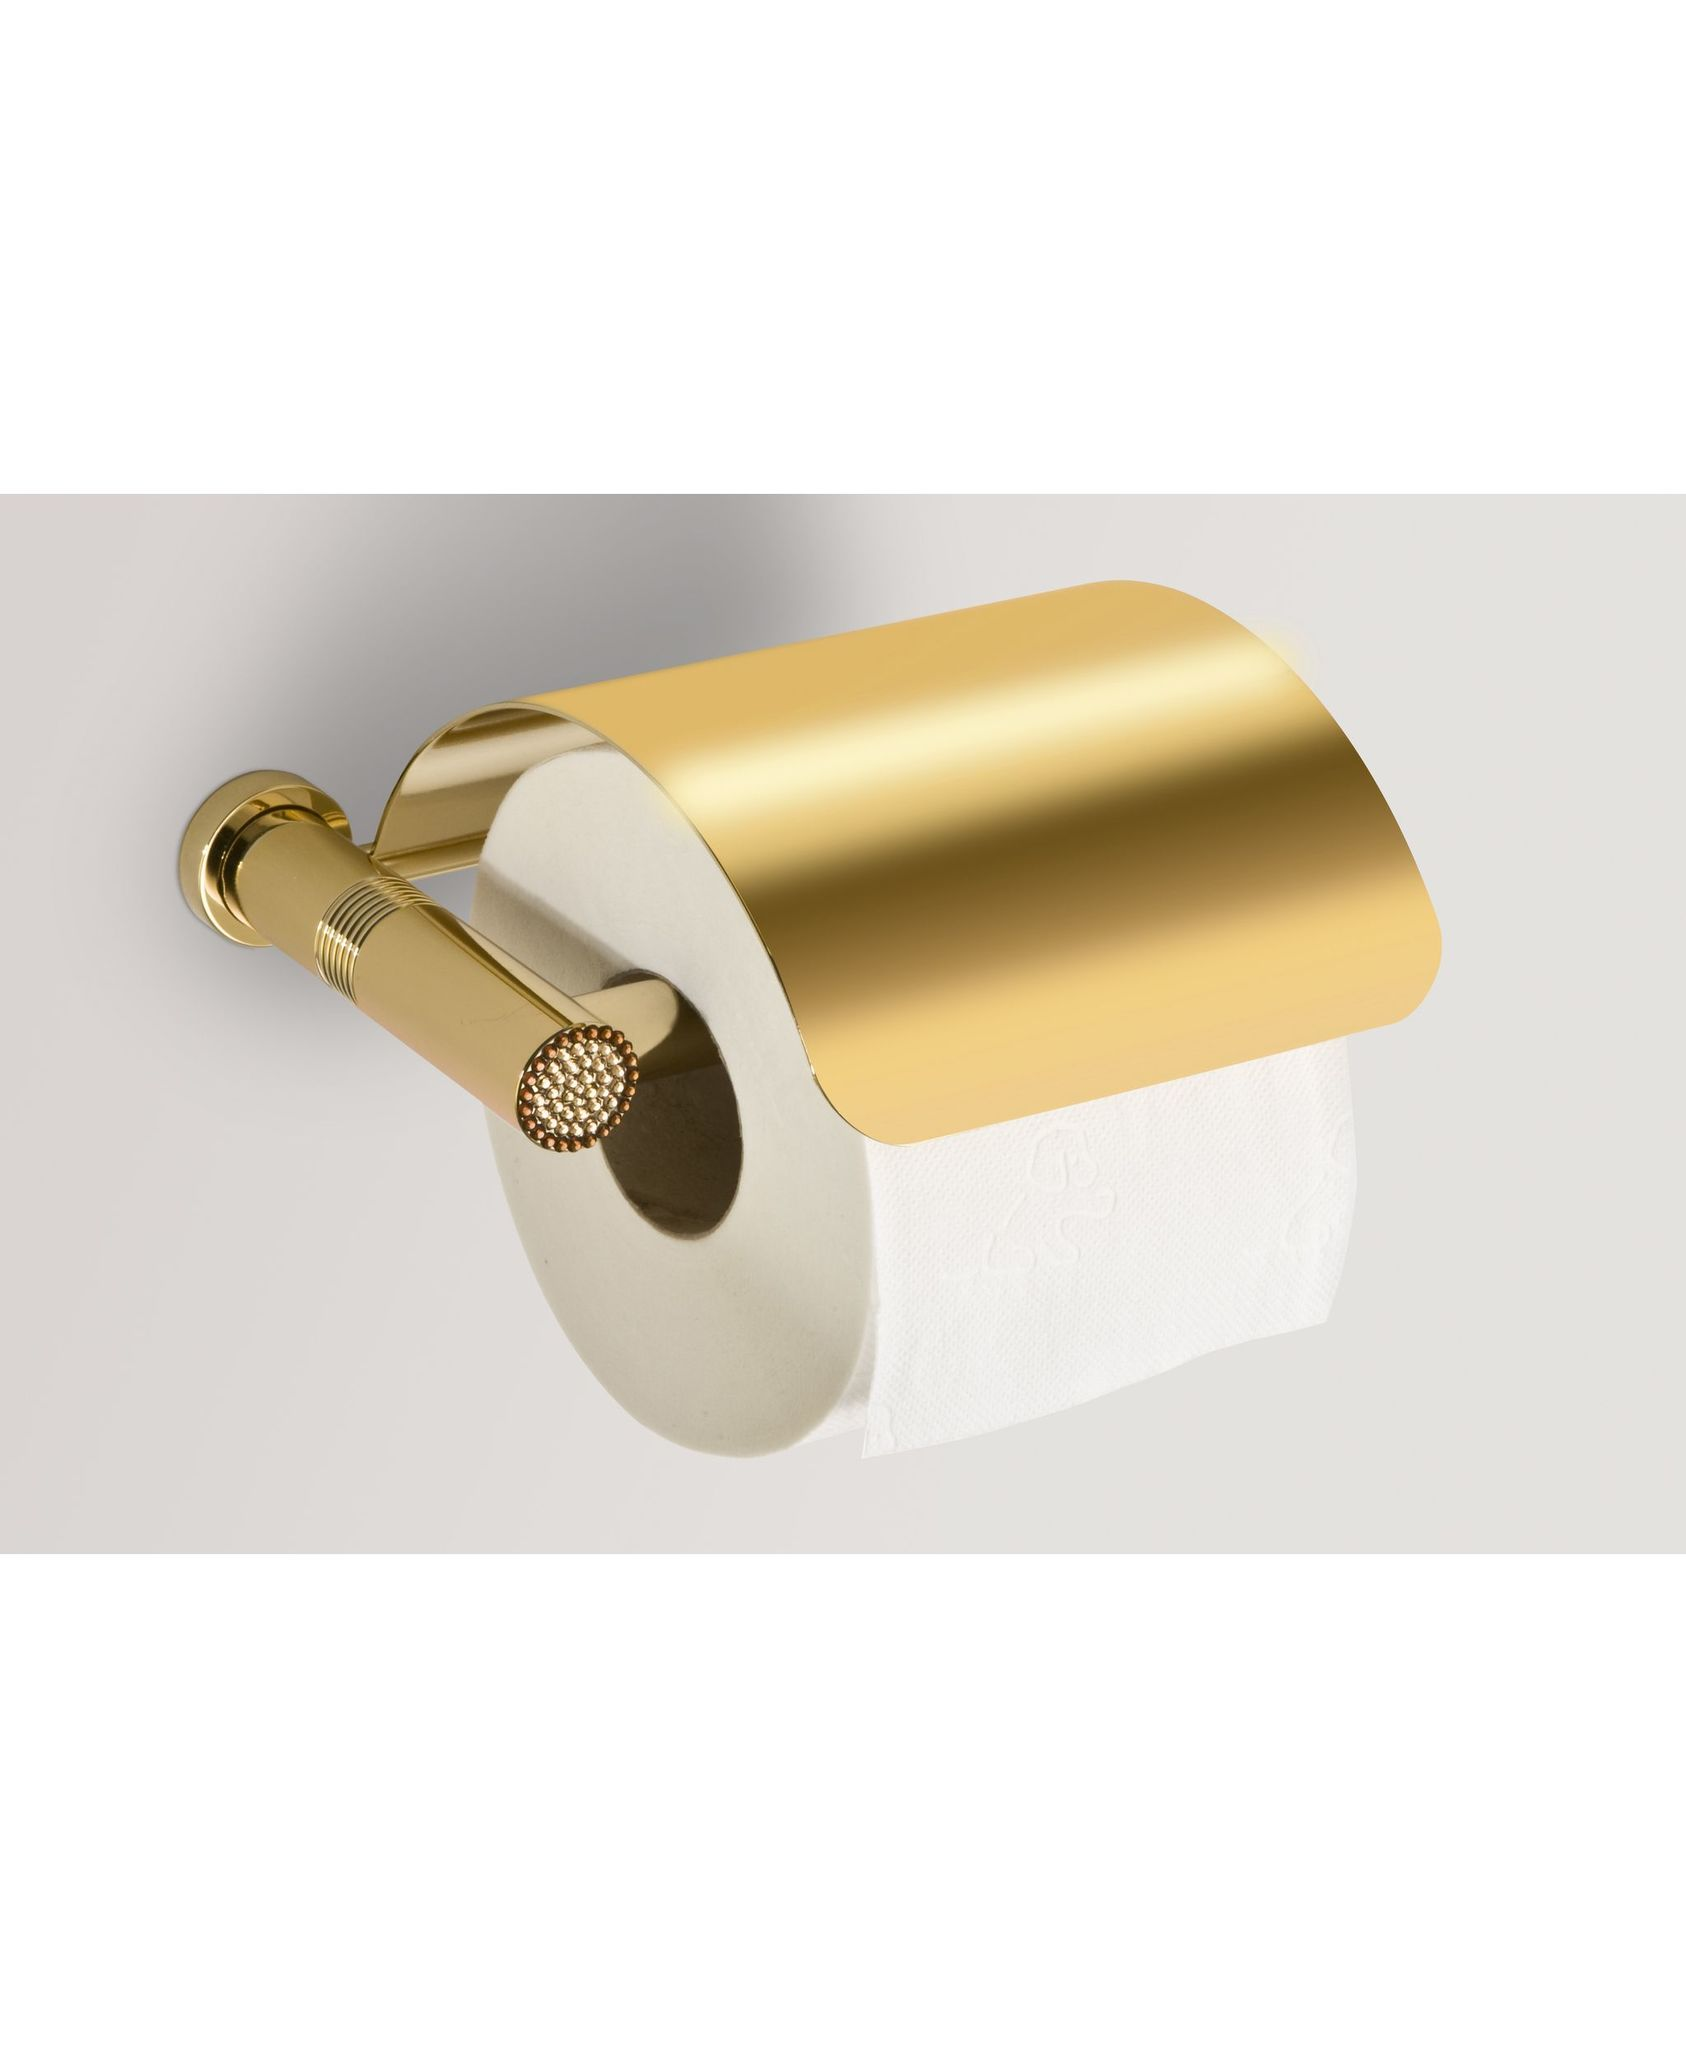 Ванная Держатель туалетной бумаги c крышкой 85551O Starlight от Windisch derzhatel-tualetnoy-bumagi-c-kryshkoy-85551-starlight-ot-windisch-ispaniya.jpg